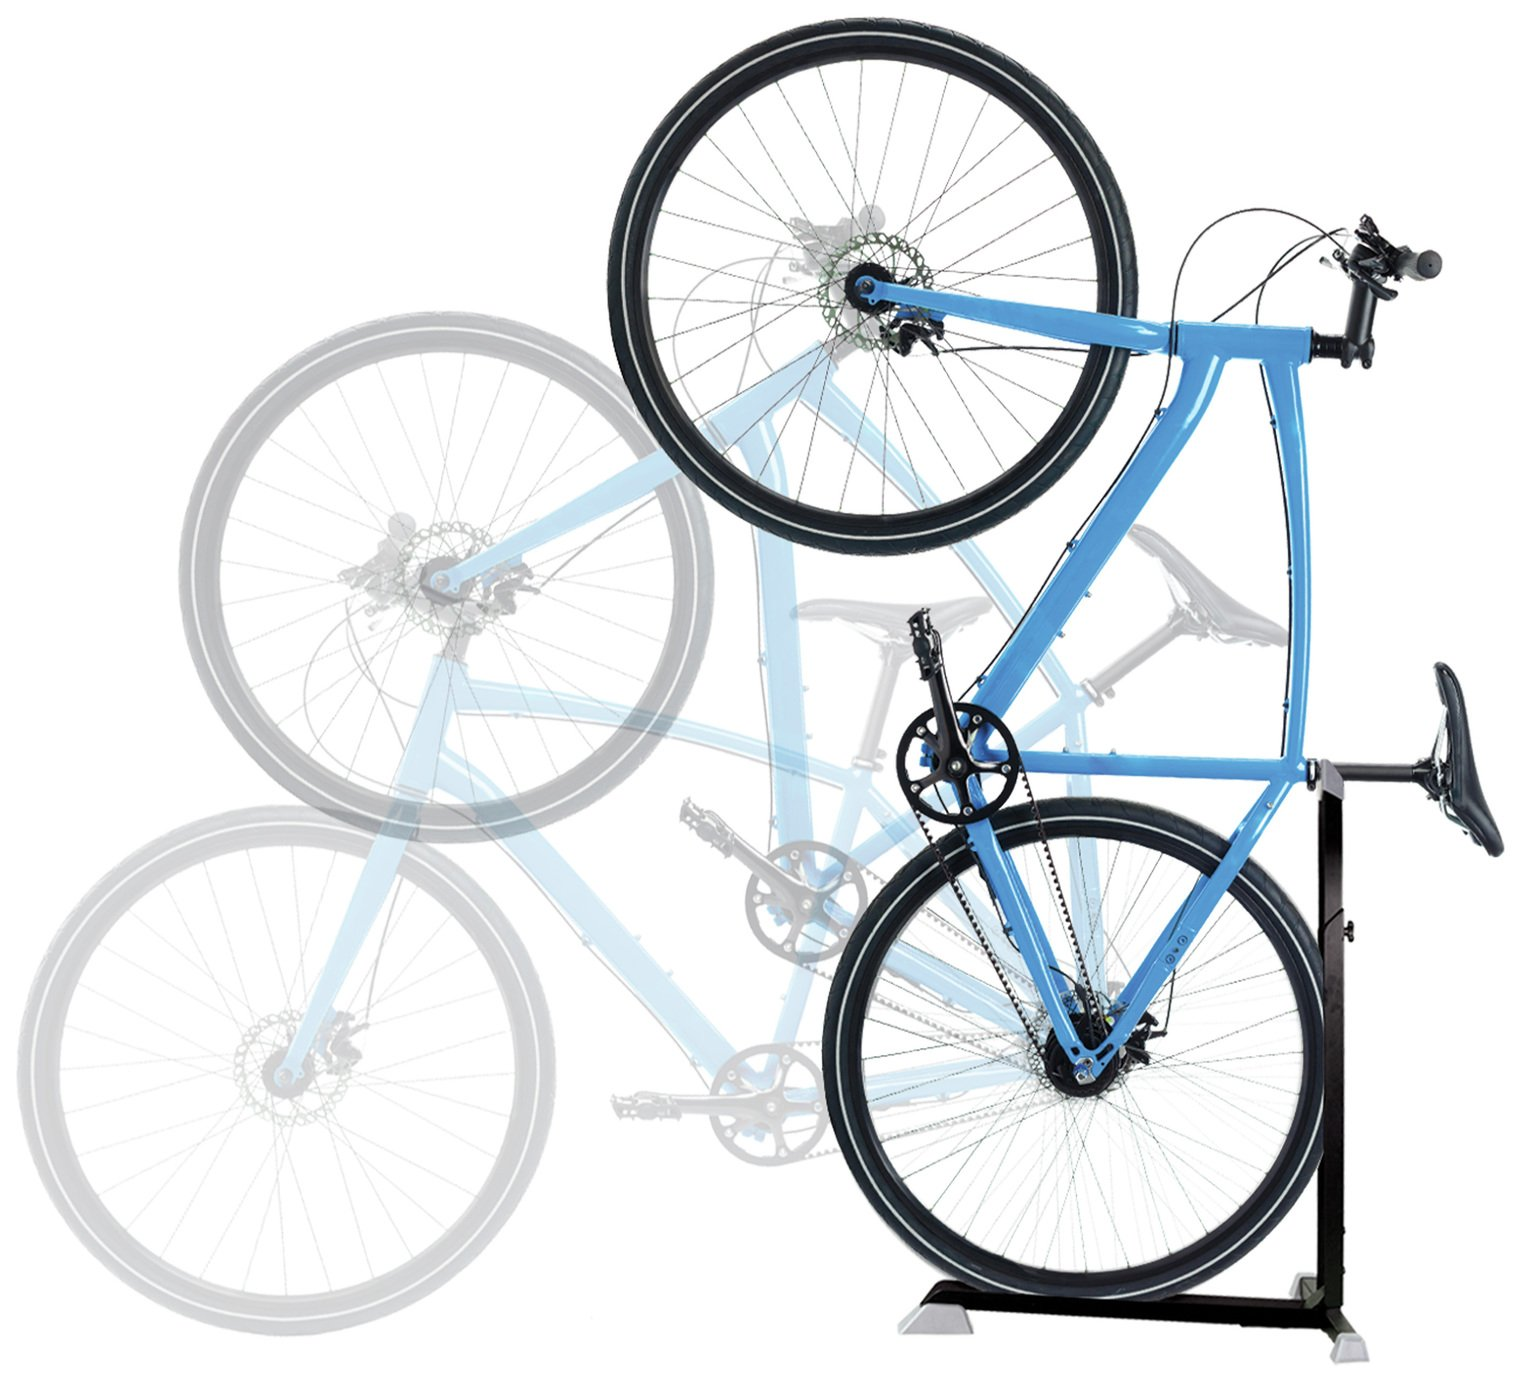 Thane Bike Nook Upright Storage